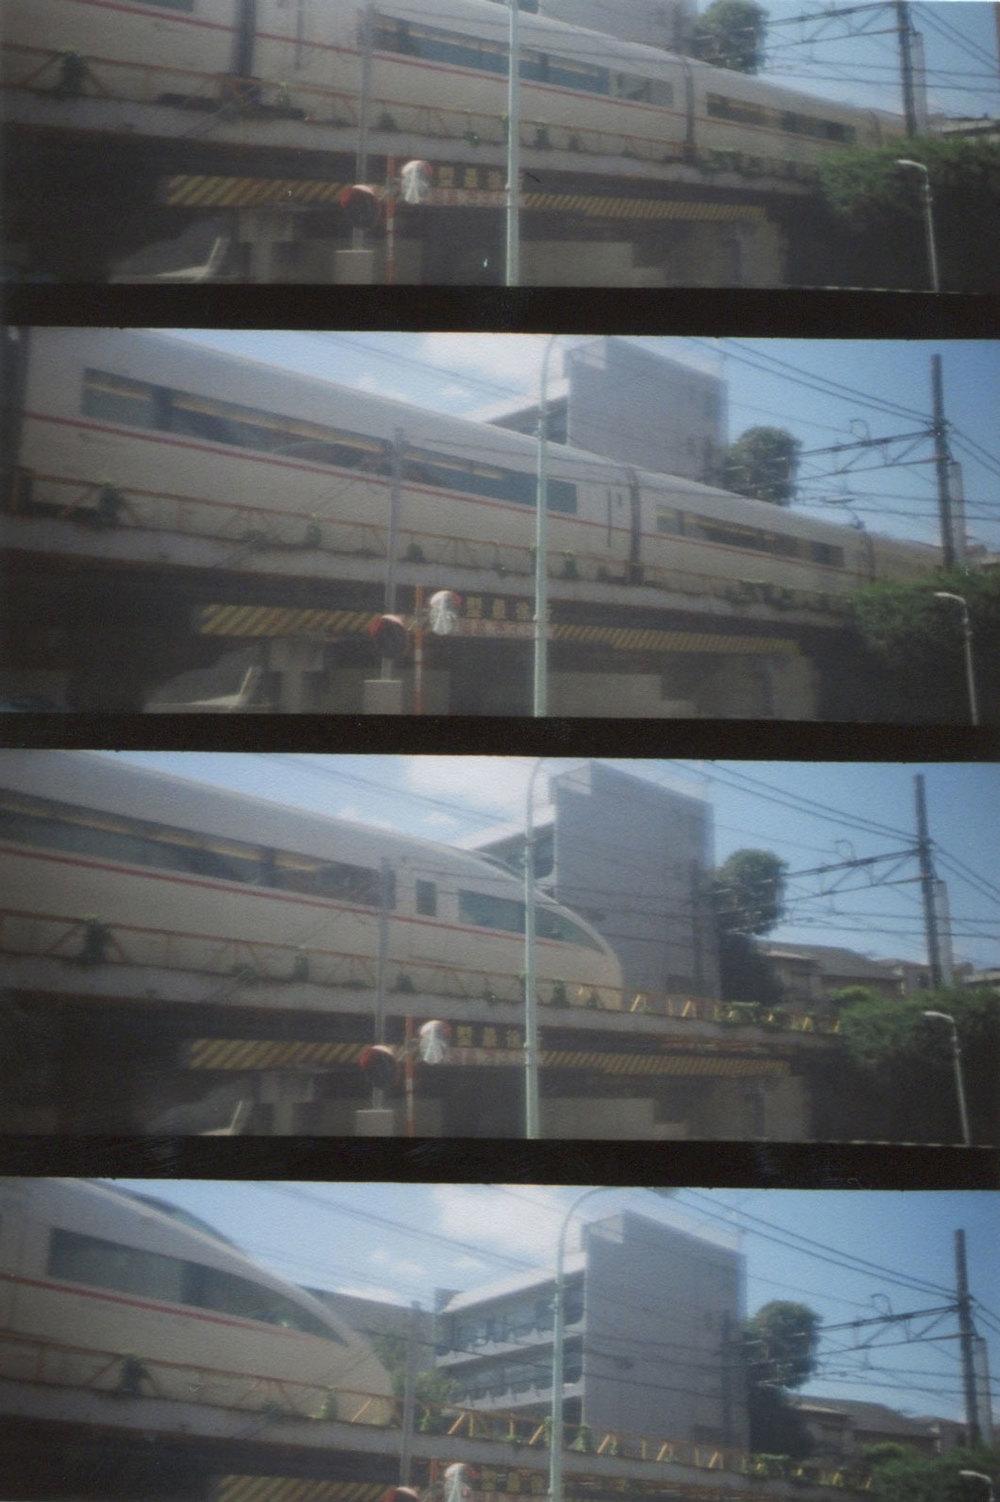 Japan_35mm_Lomokino_02.jpg